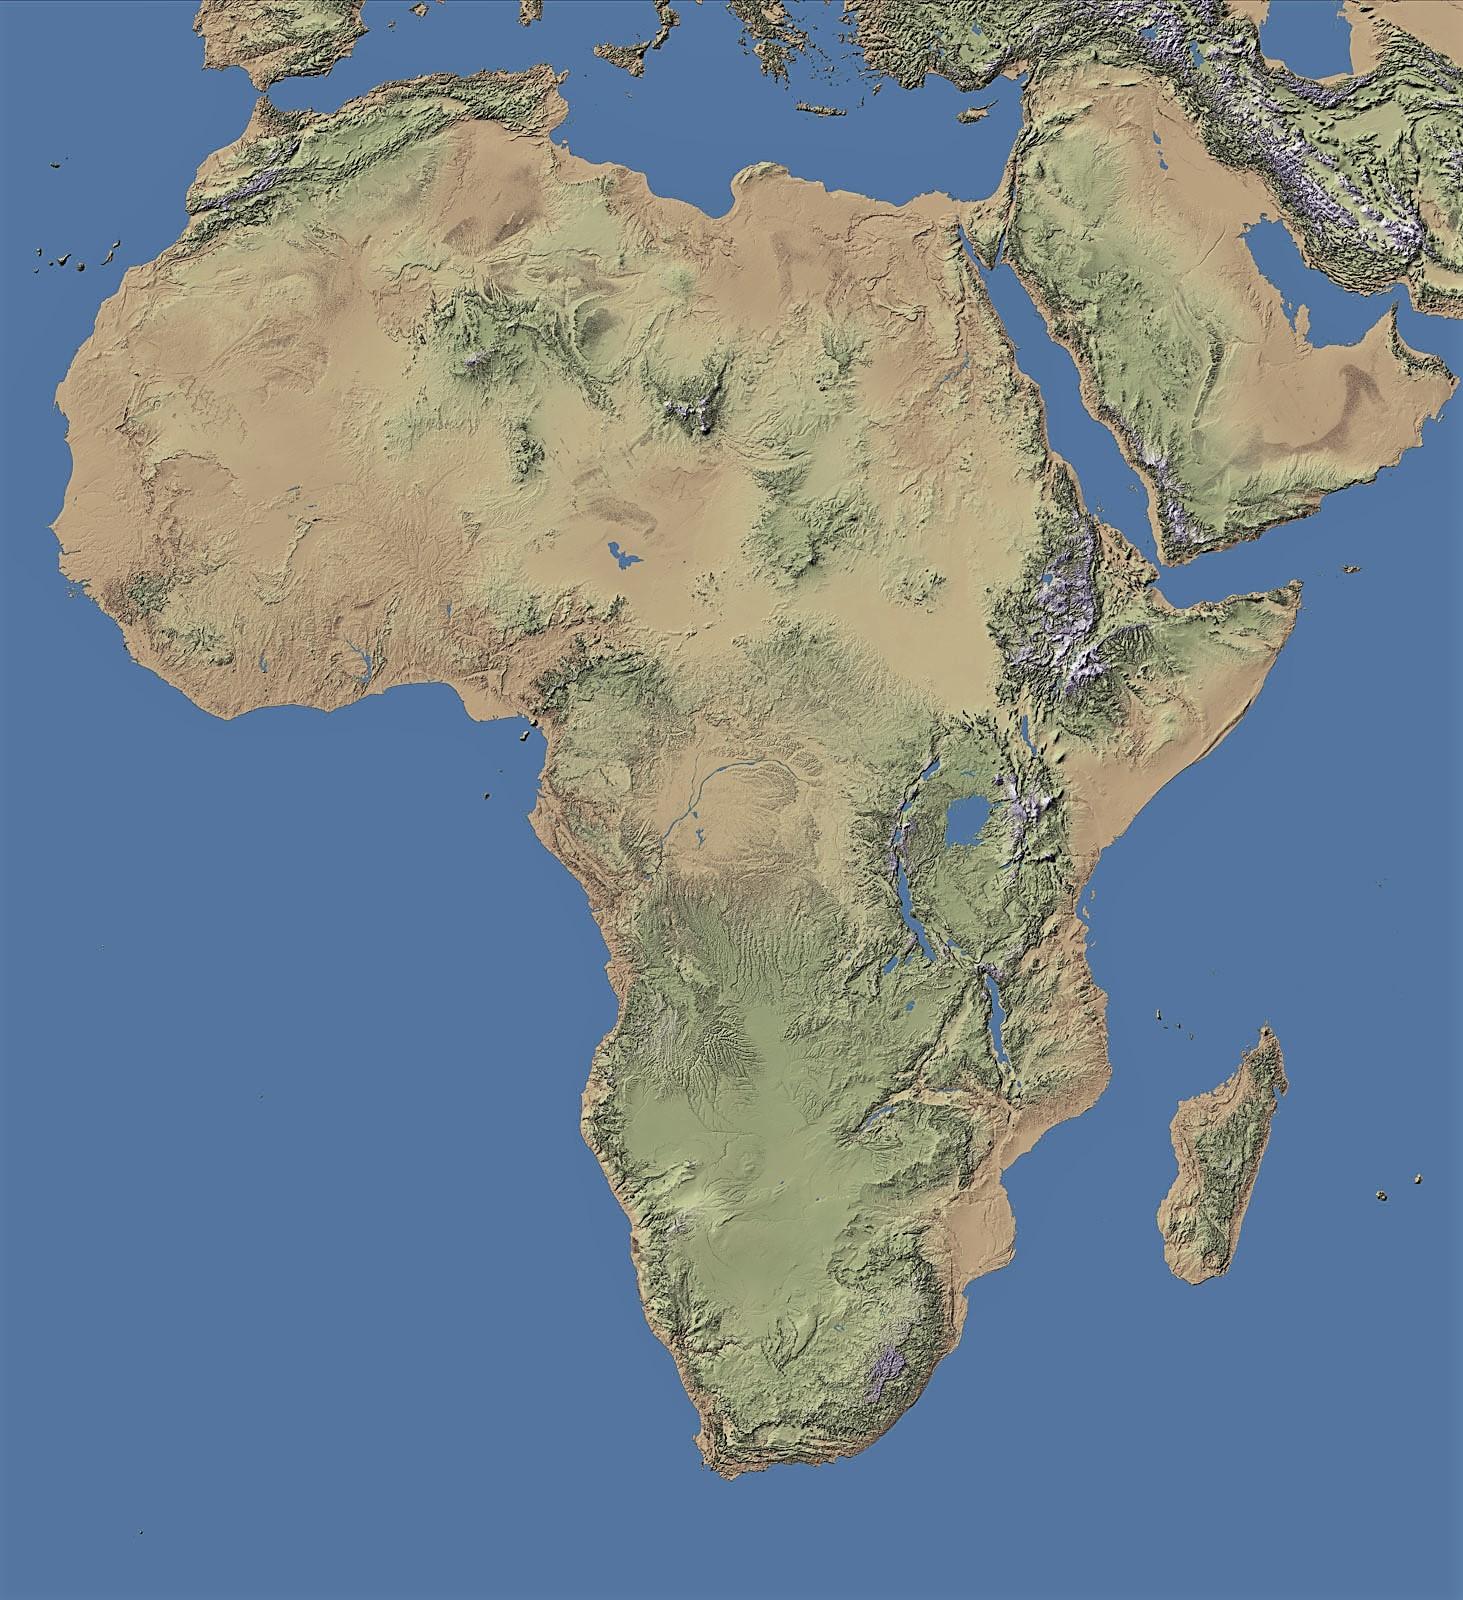 Mapa De áfrica Para Imprimir Político Físico Mudo Continente Africano